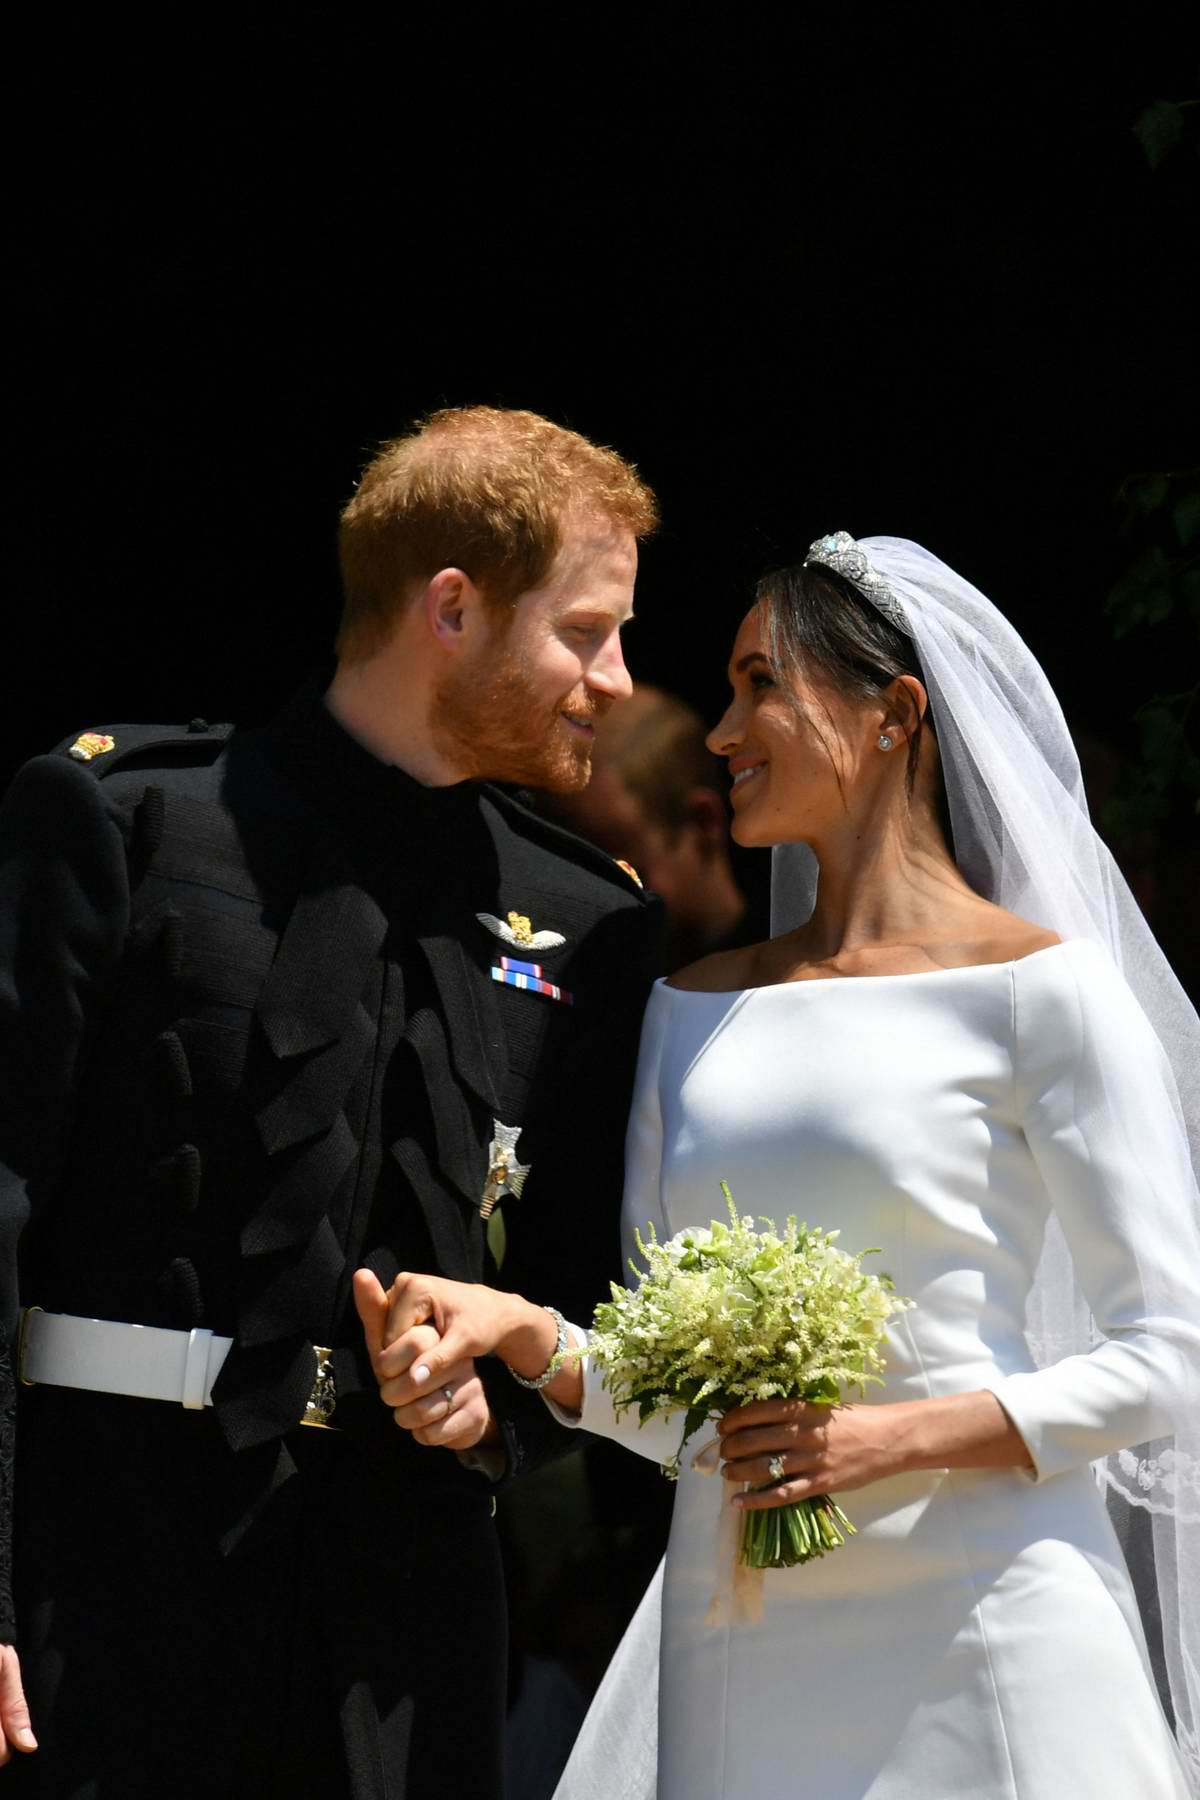 The Royal Wedding of Prince Harry & Meghan Markle at Windsor Castle, UK